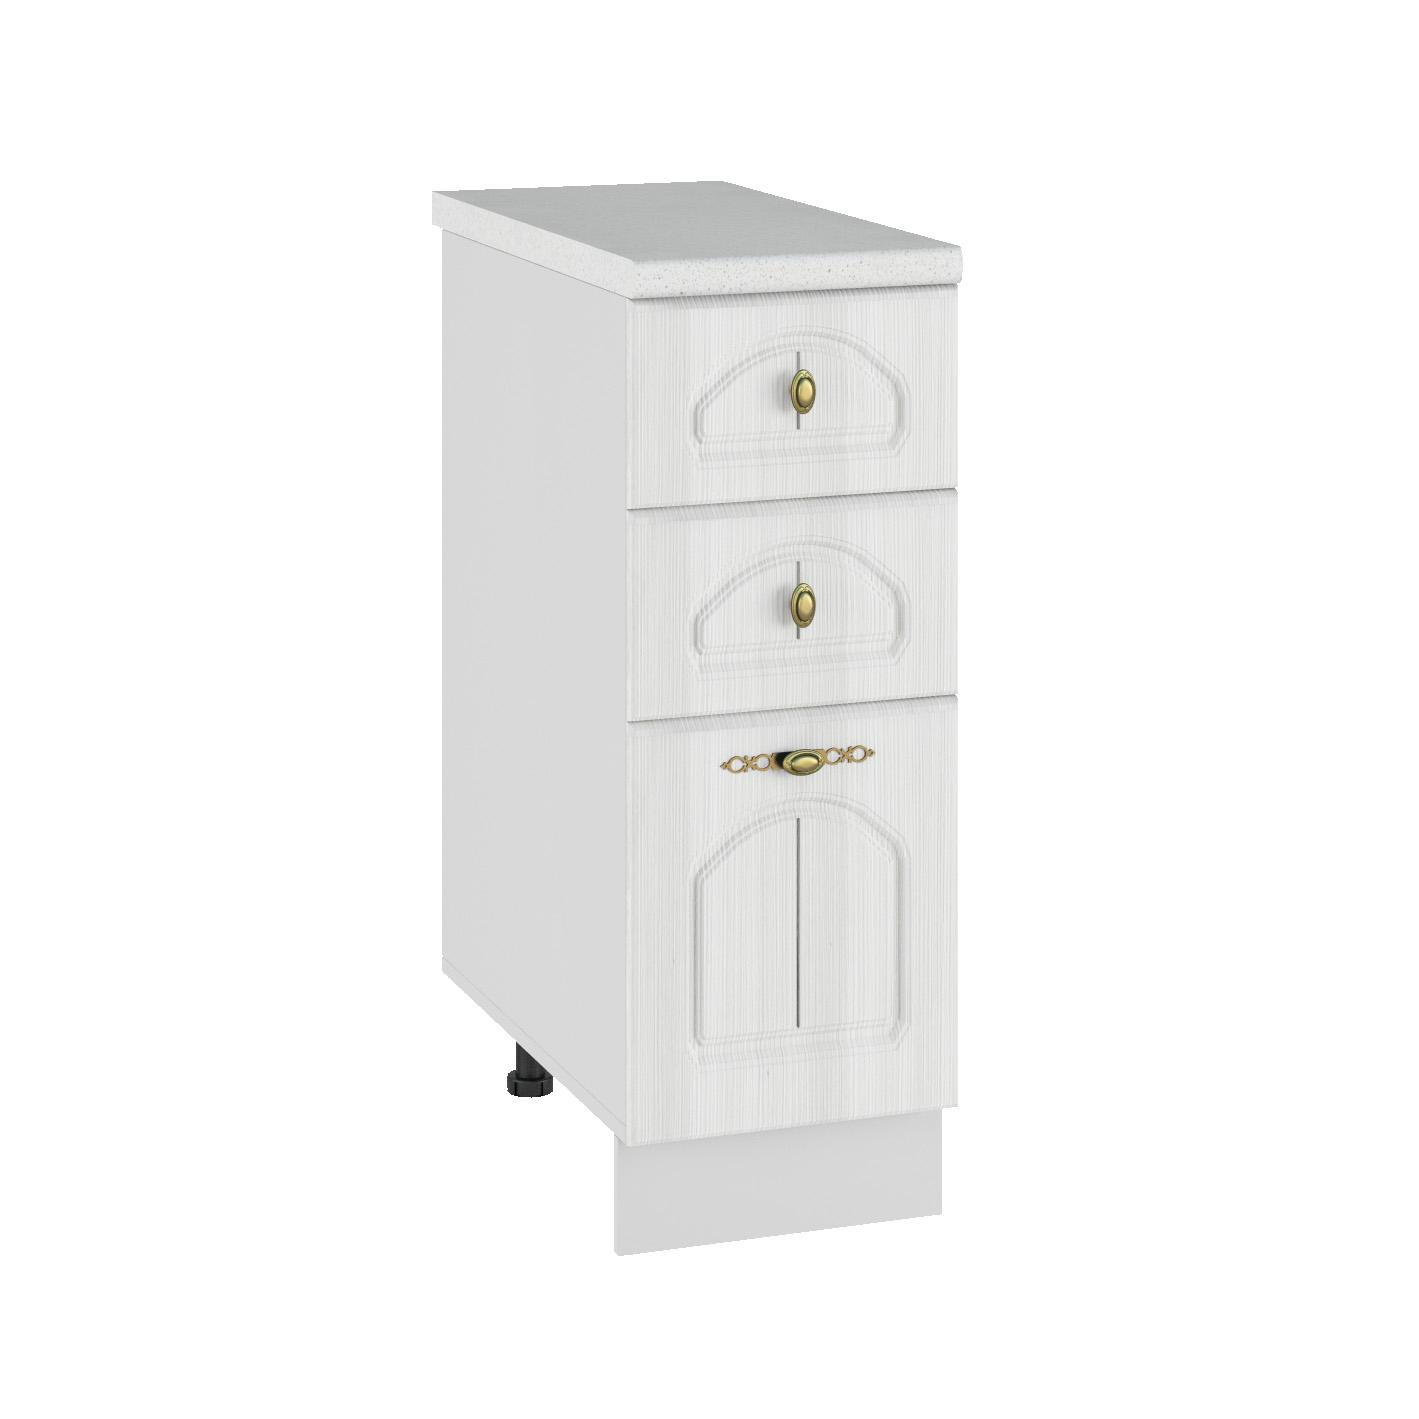 Кухня Монако СЯ 300 Шкаф нижний с ящиками